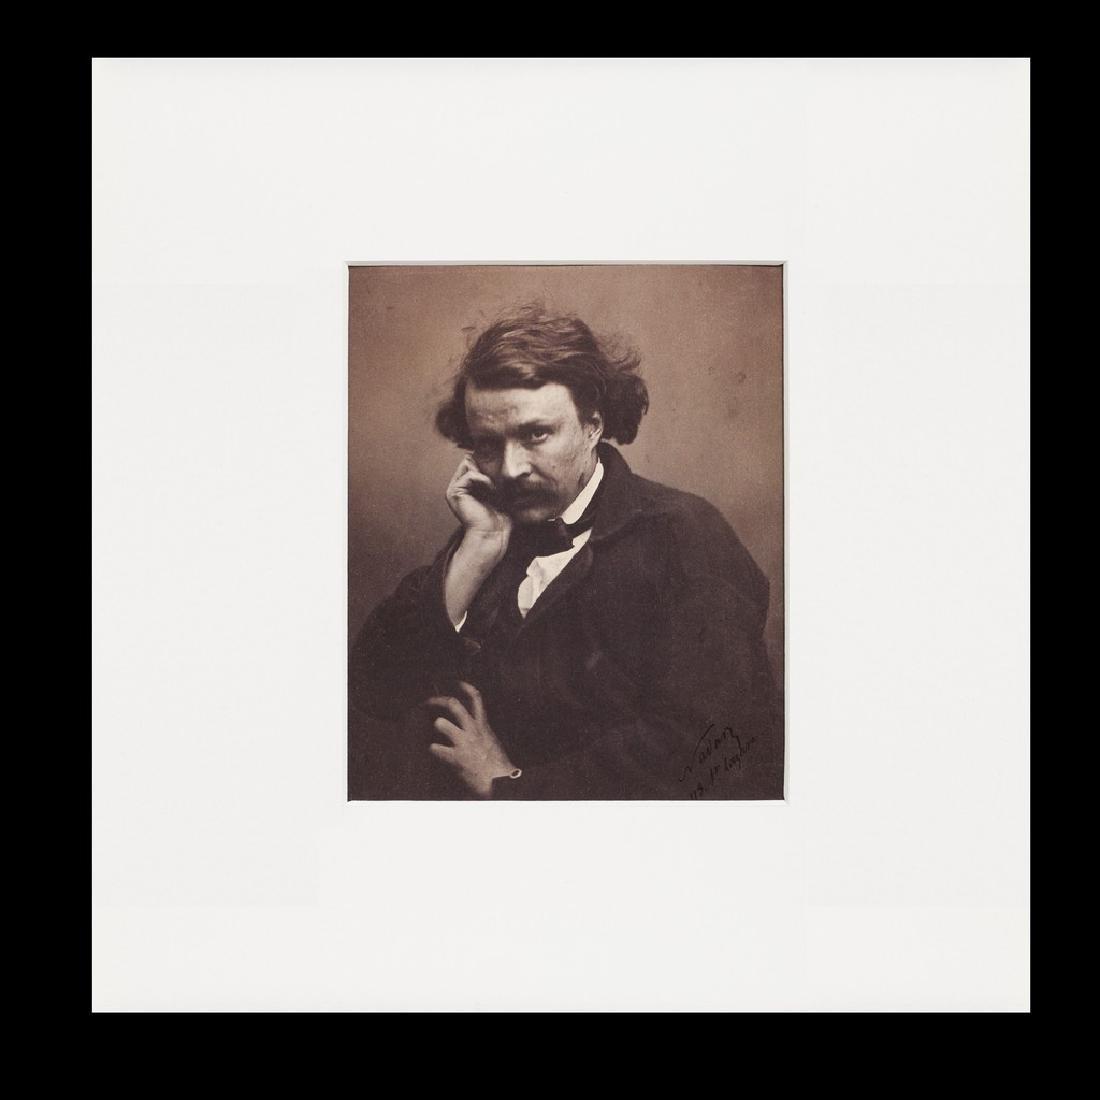 Nadar (French, 1820 - 1910) [Gaspard Félix Tournachon] - 3